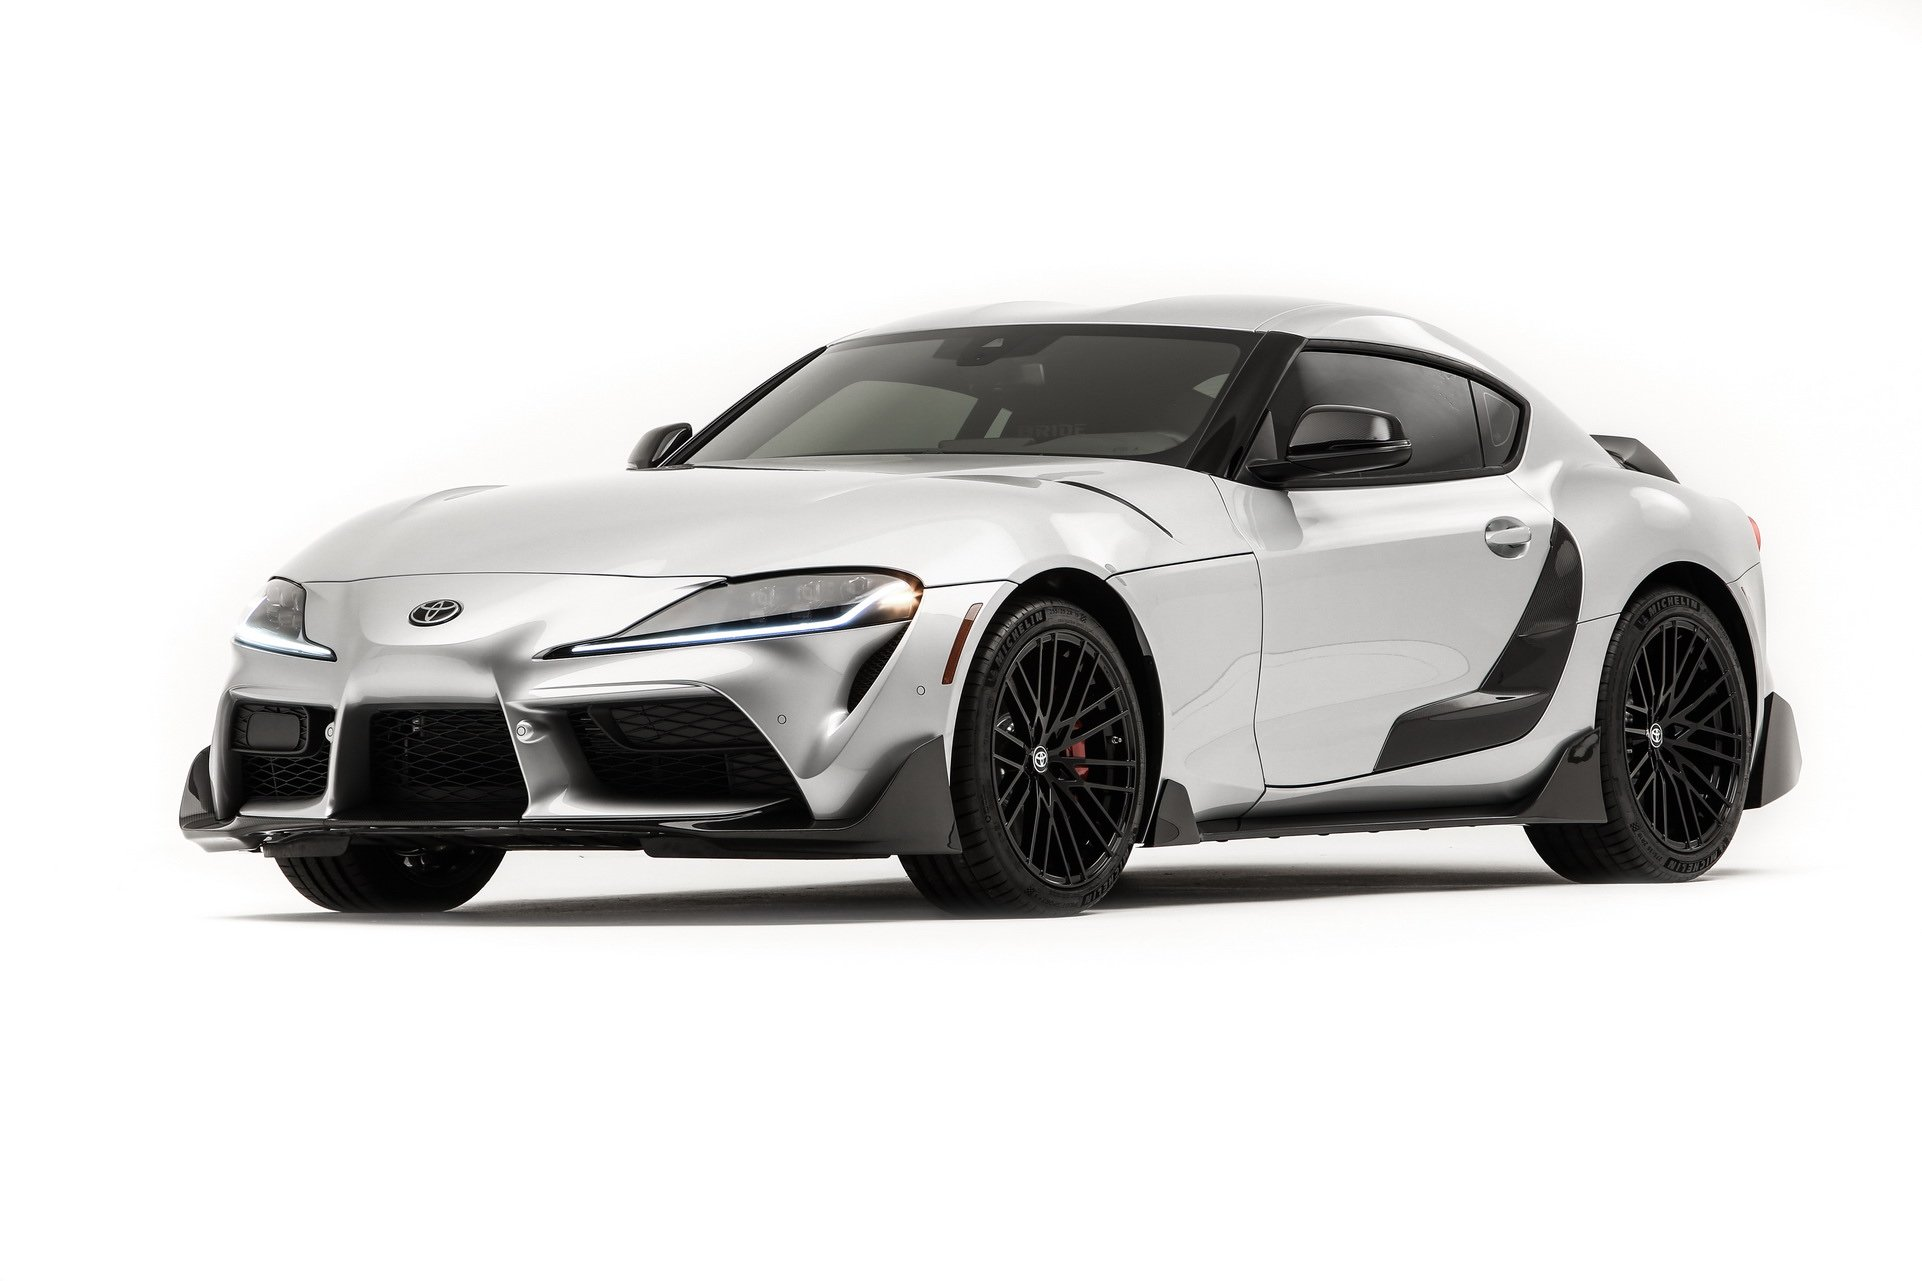 2020-Toyota-GR-Supra-Performance-Line-Concept3